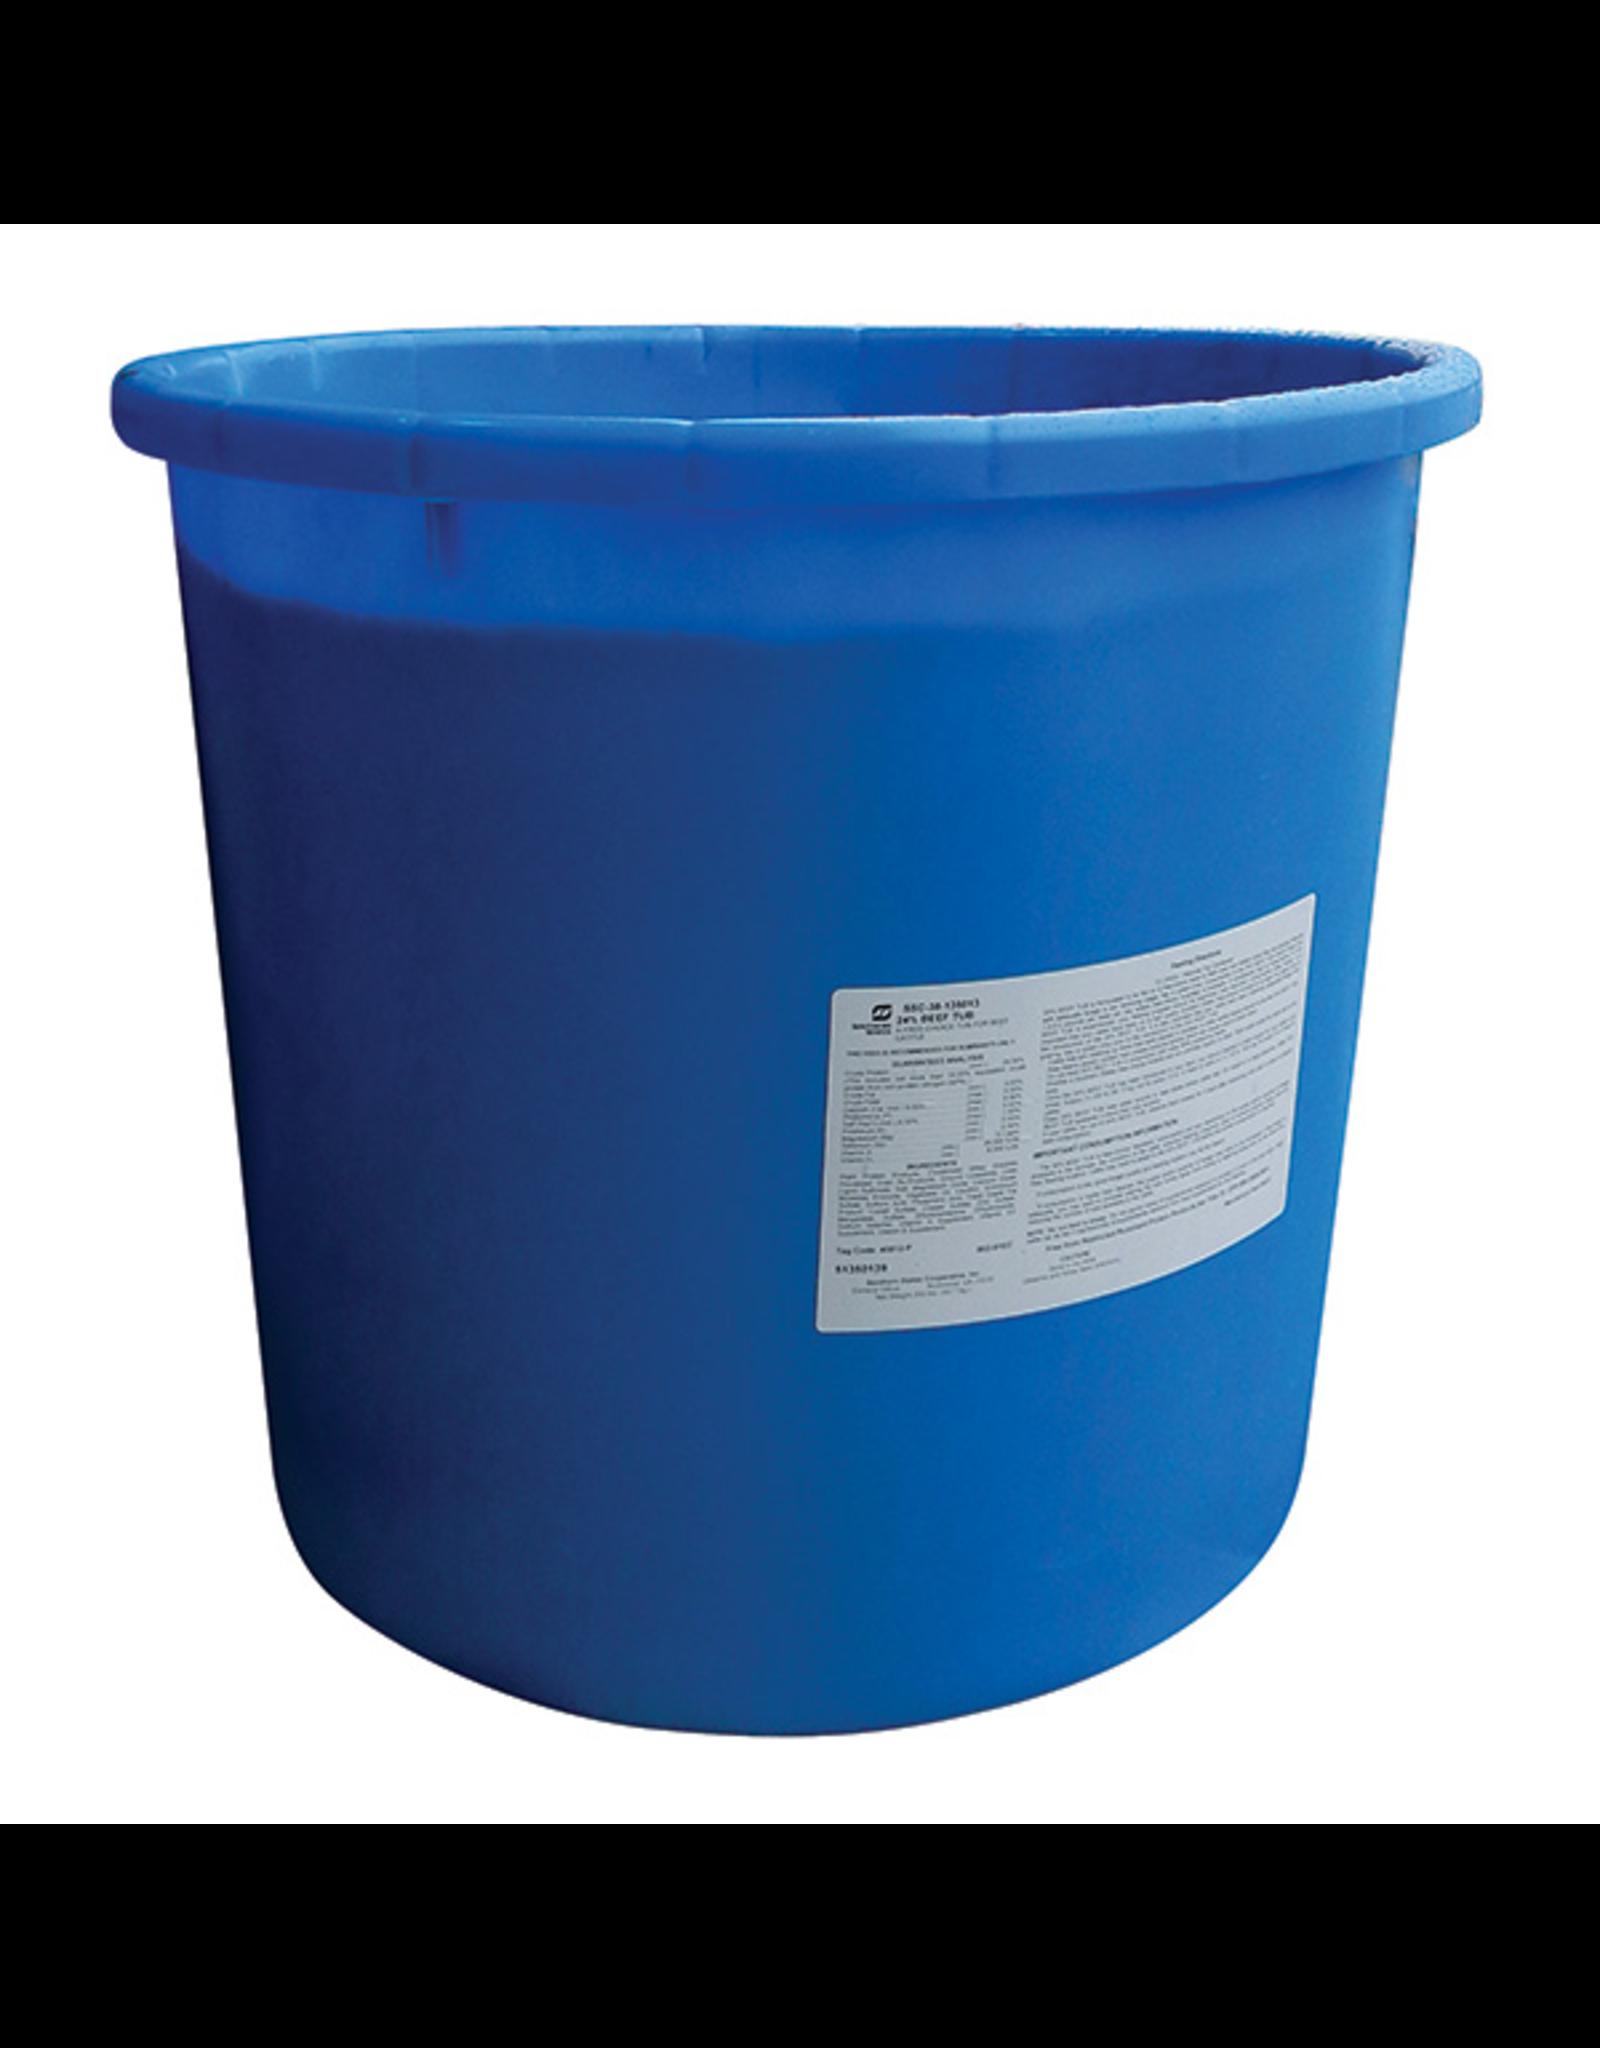 Cargill 24% Traditional Beef Tub 200lb